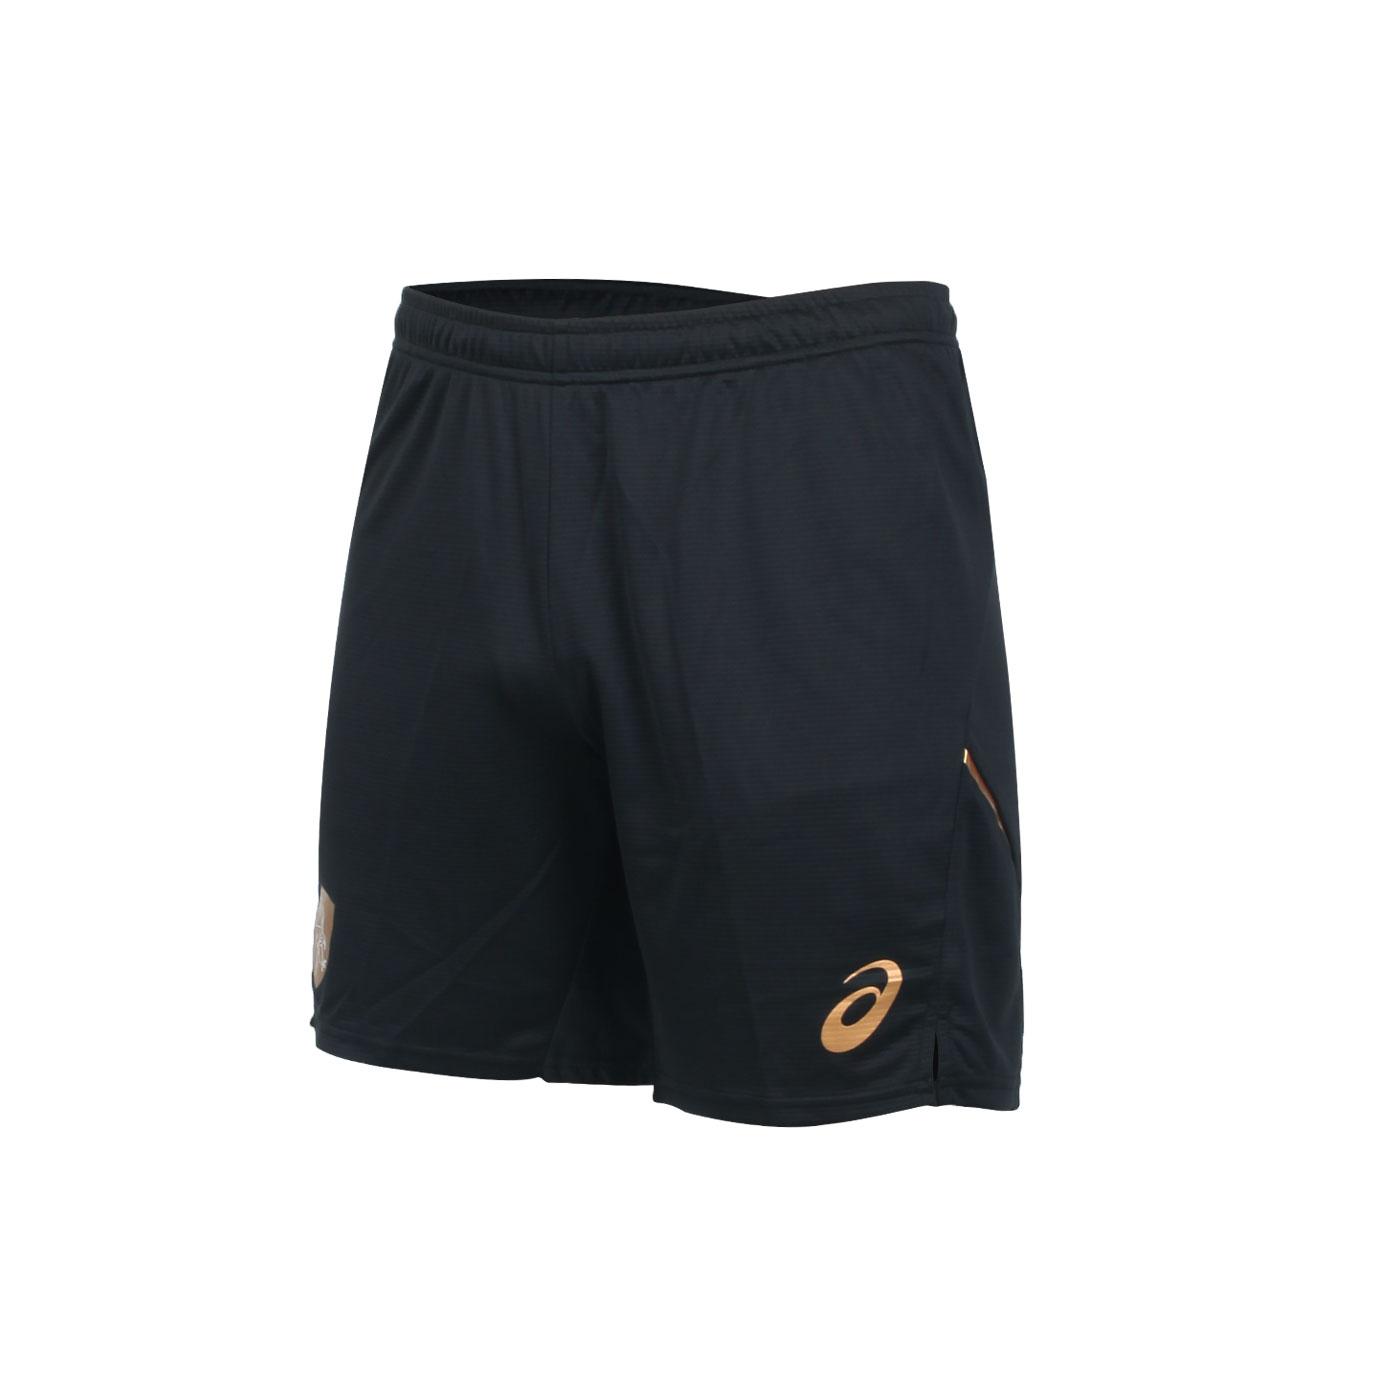 ASICS 男款針織短褲 2051A248-001 - 黑金